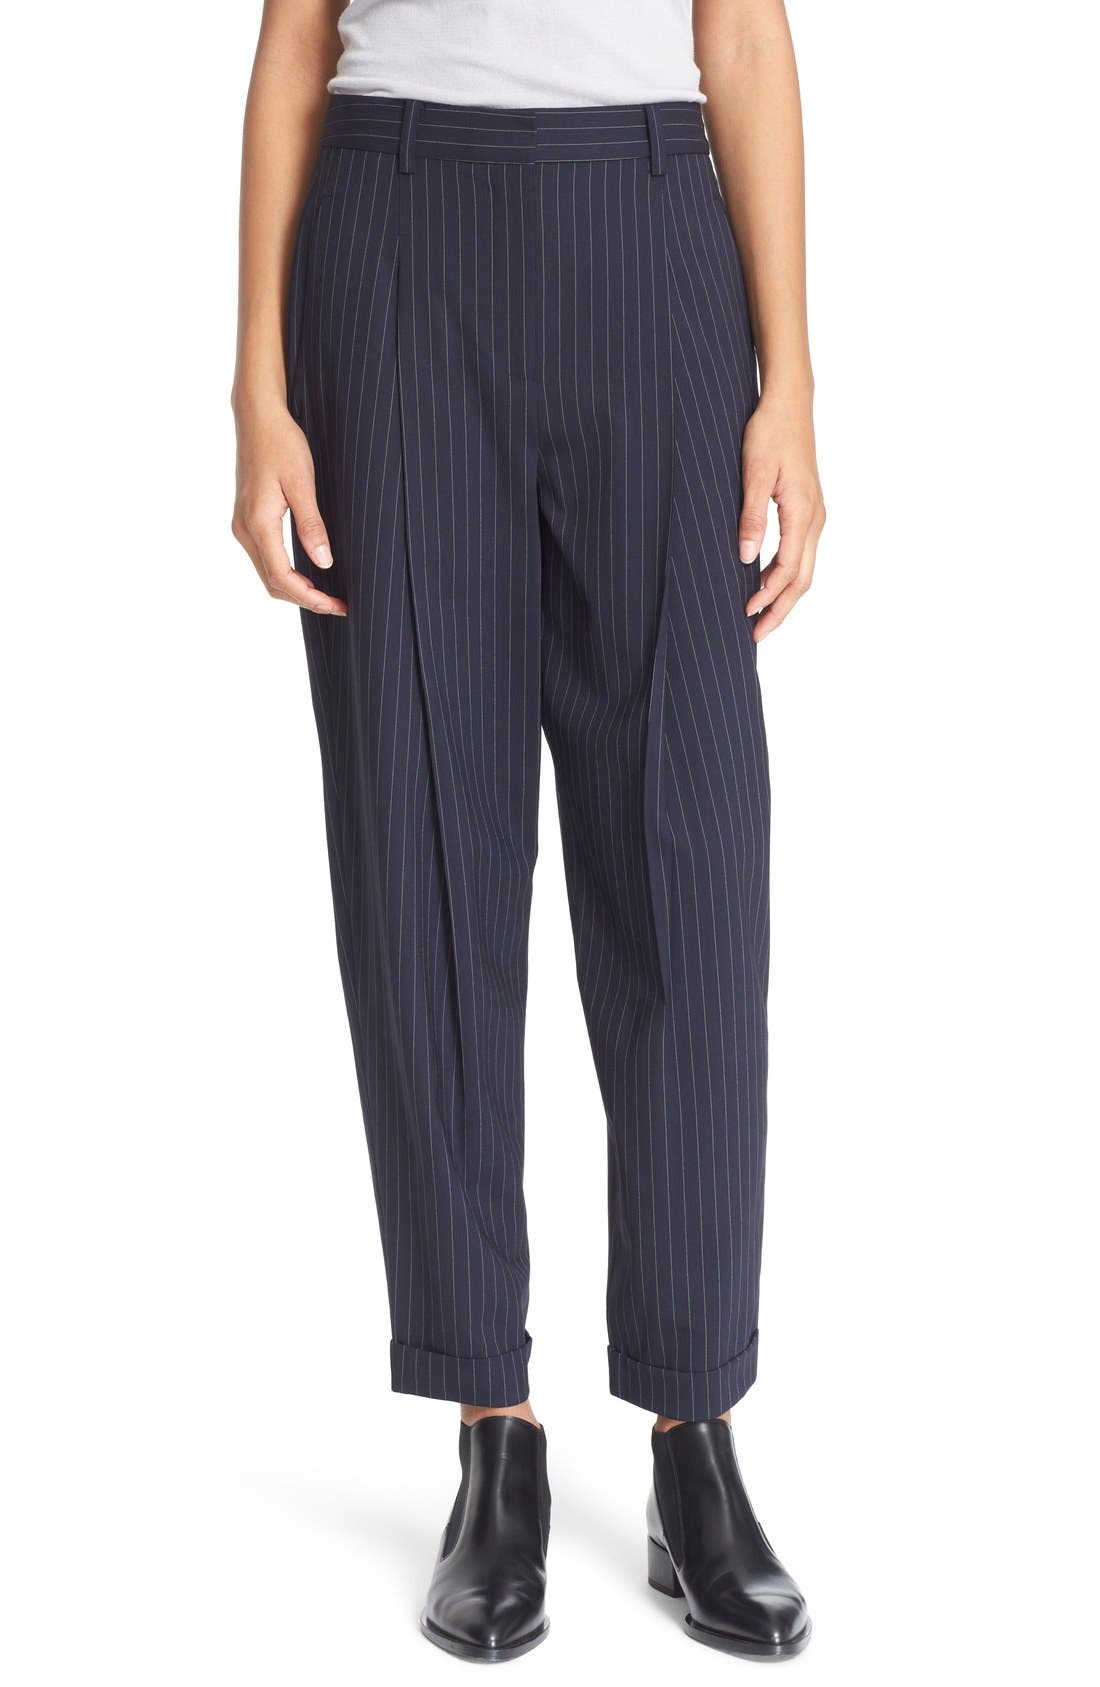 Alternate Image 1 Selected - DKNY Pinstripe Cuff Pants